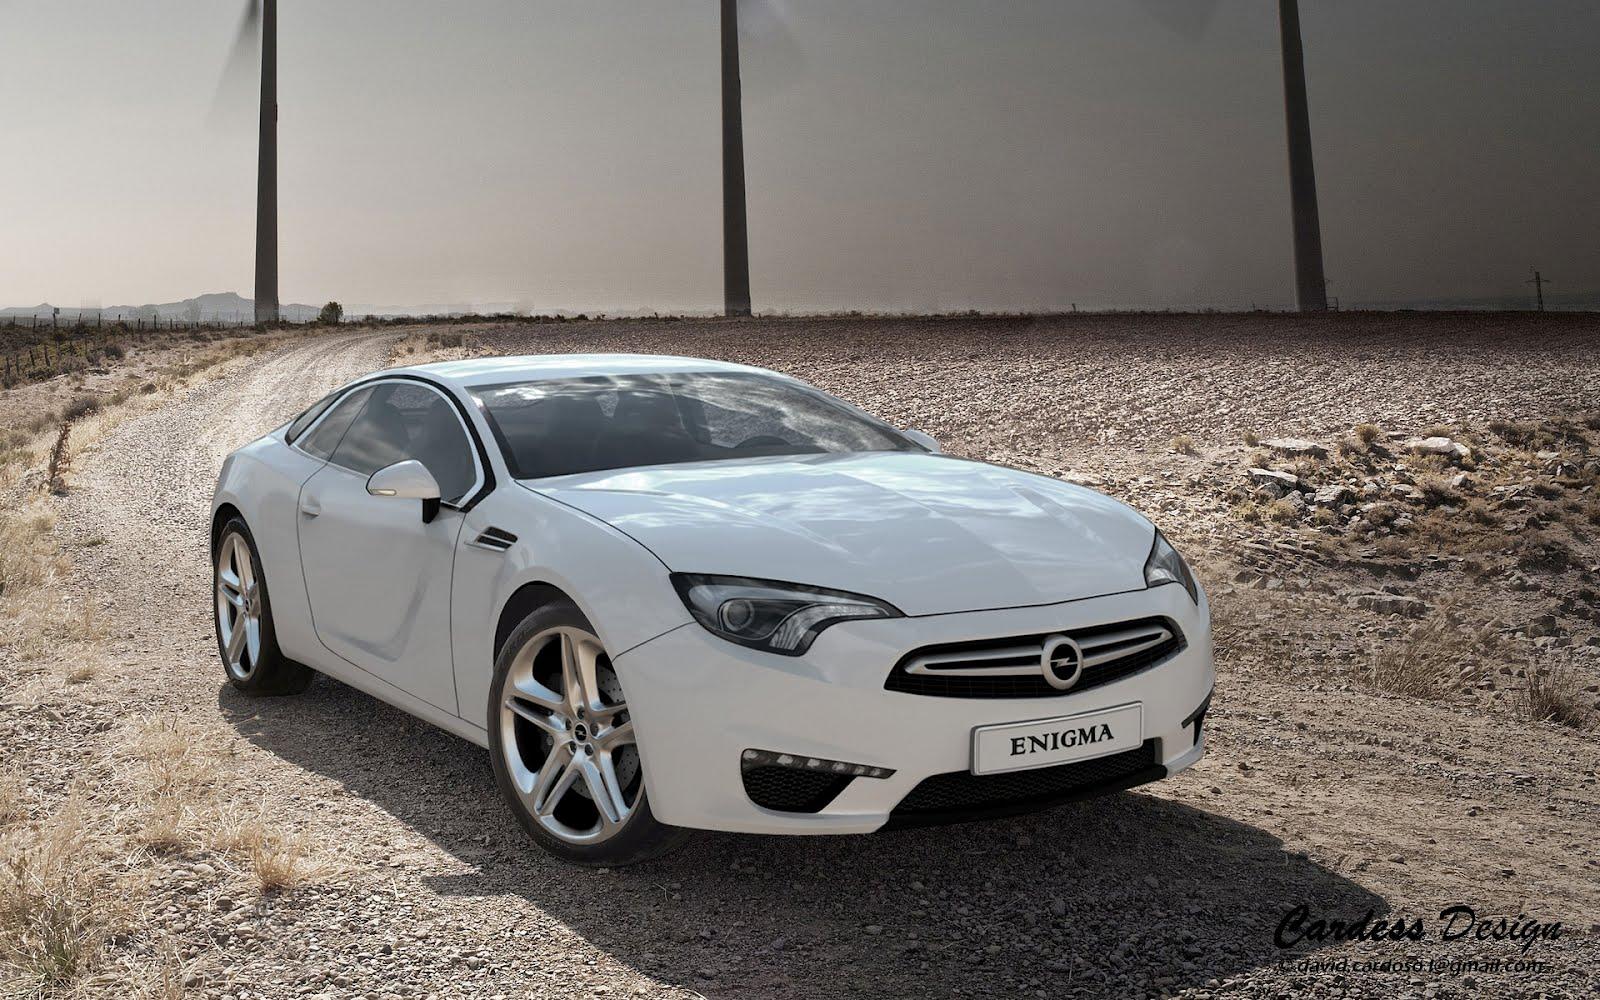 [Présentation] Le design par Opel - Page 3 S0-design-Opel-Enigma-une-Camaro-europeenne-258908